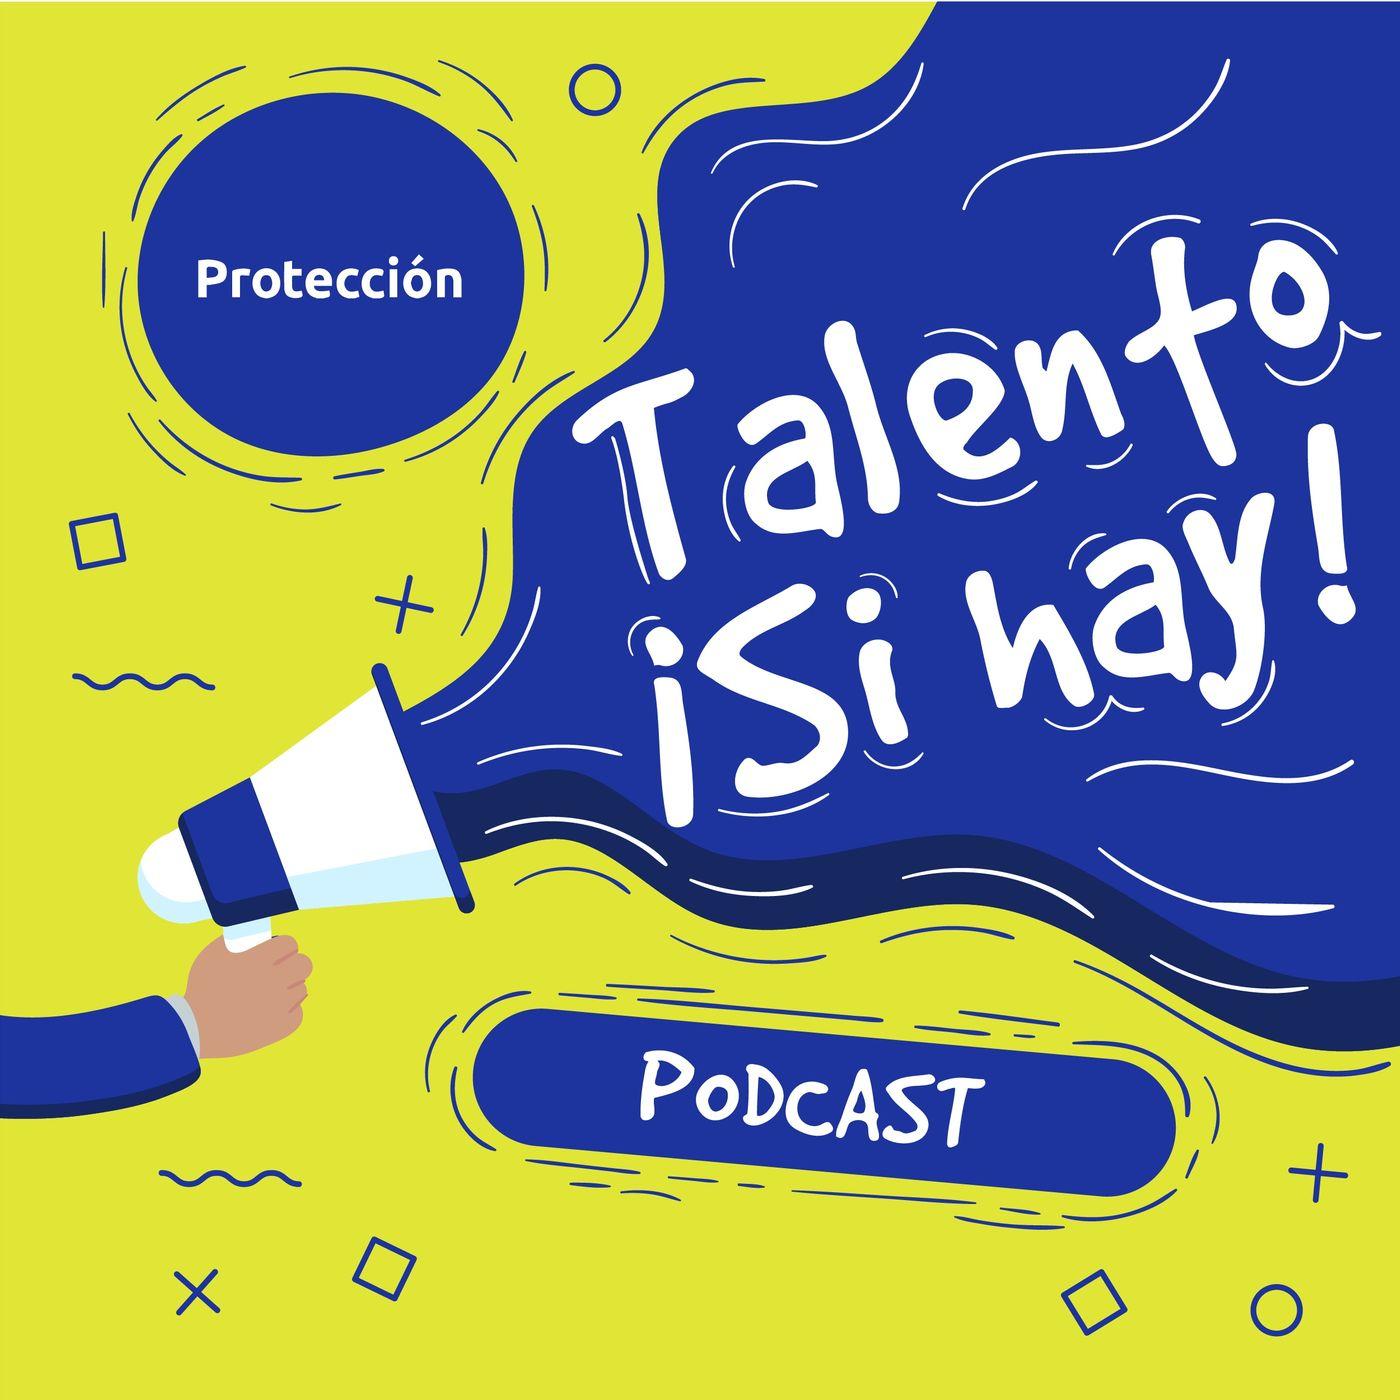 EP 03: Conectar puntos y pedir ayuda con Juan David Aristizabal